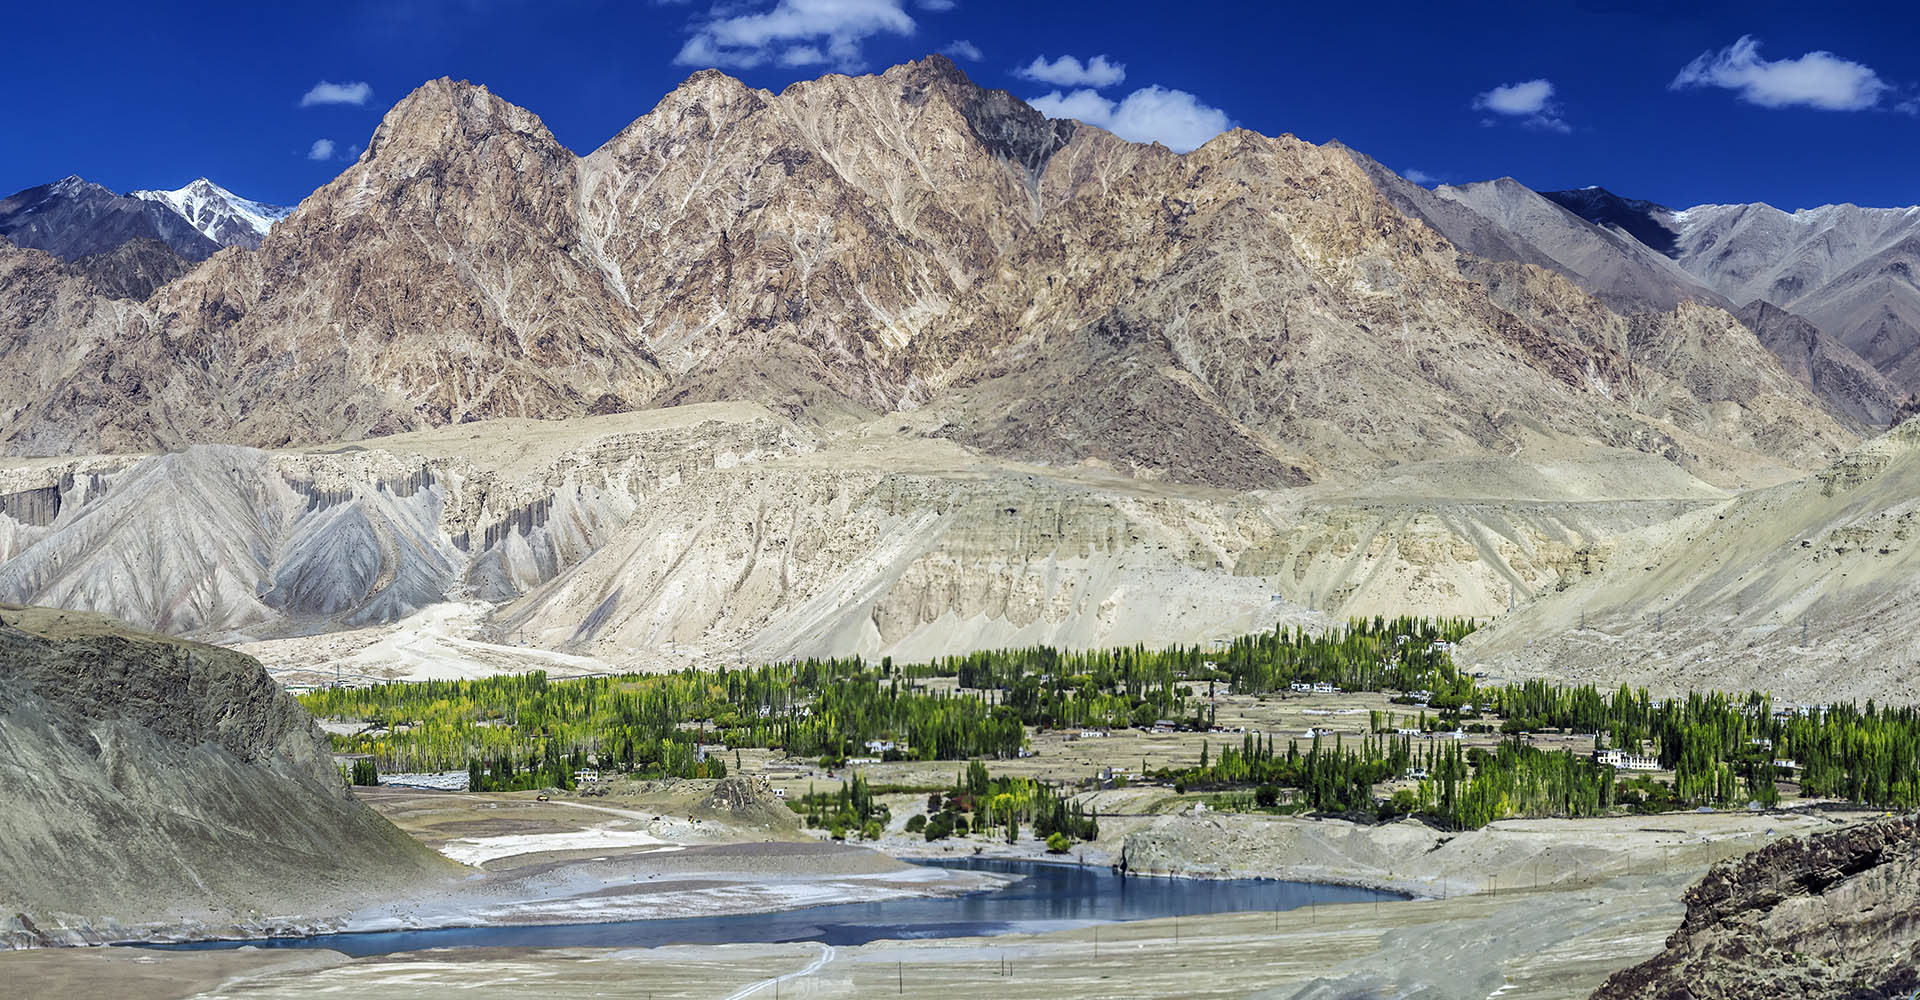 Ladakh - A Land of Fascination and Wonder